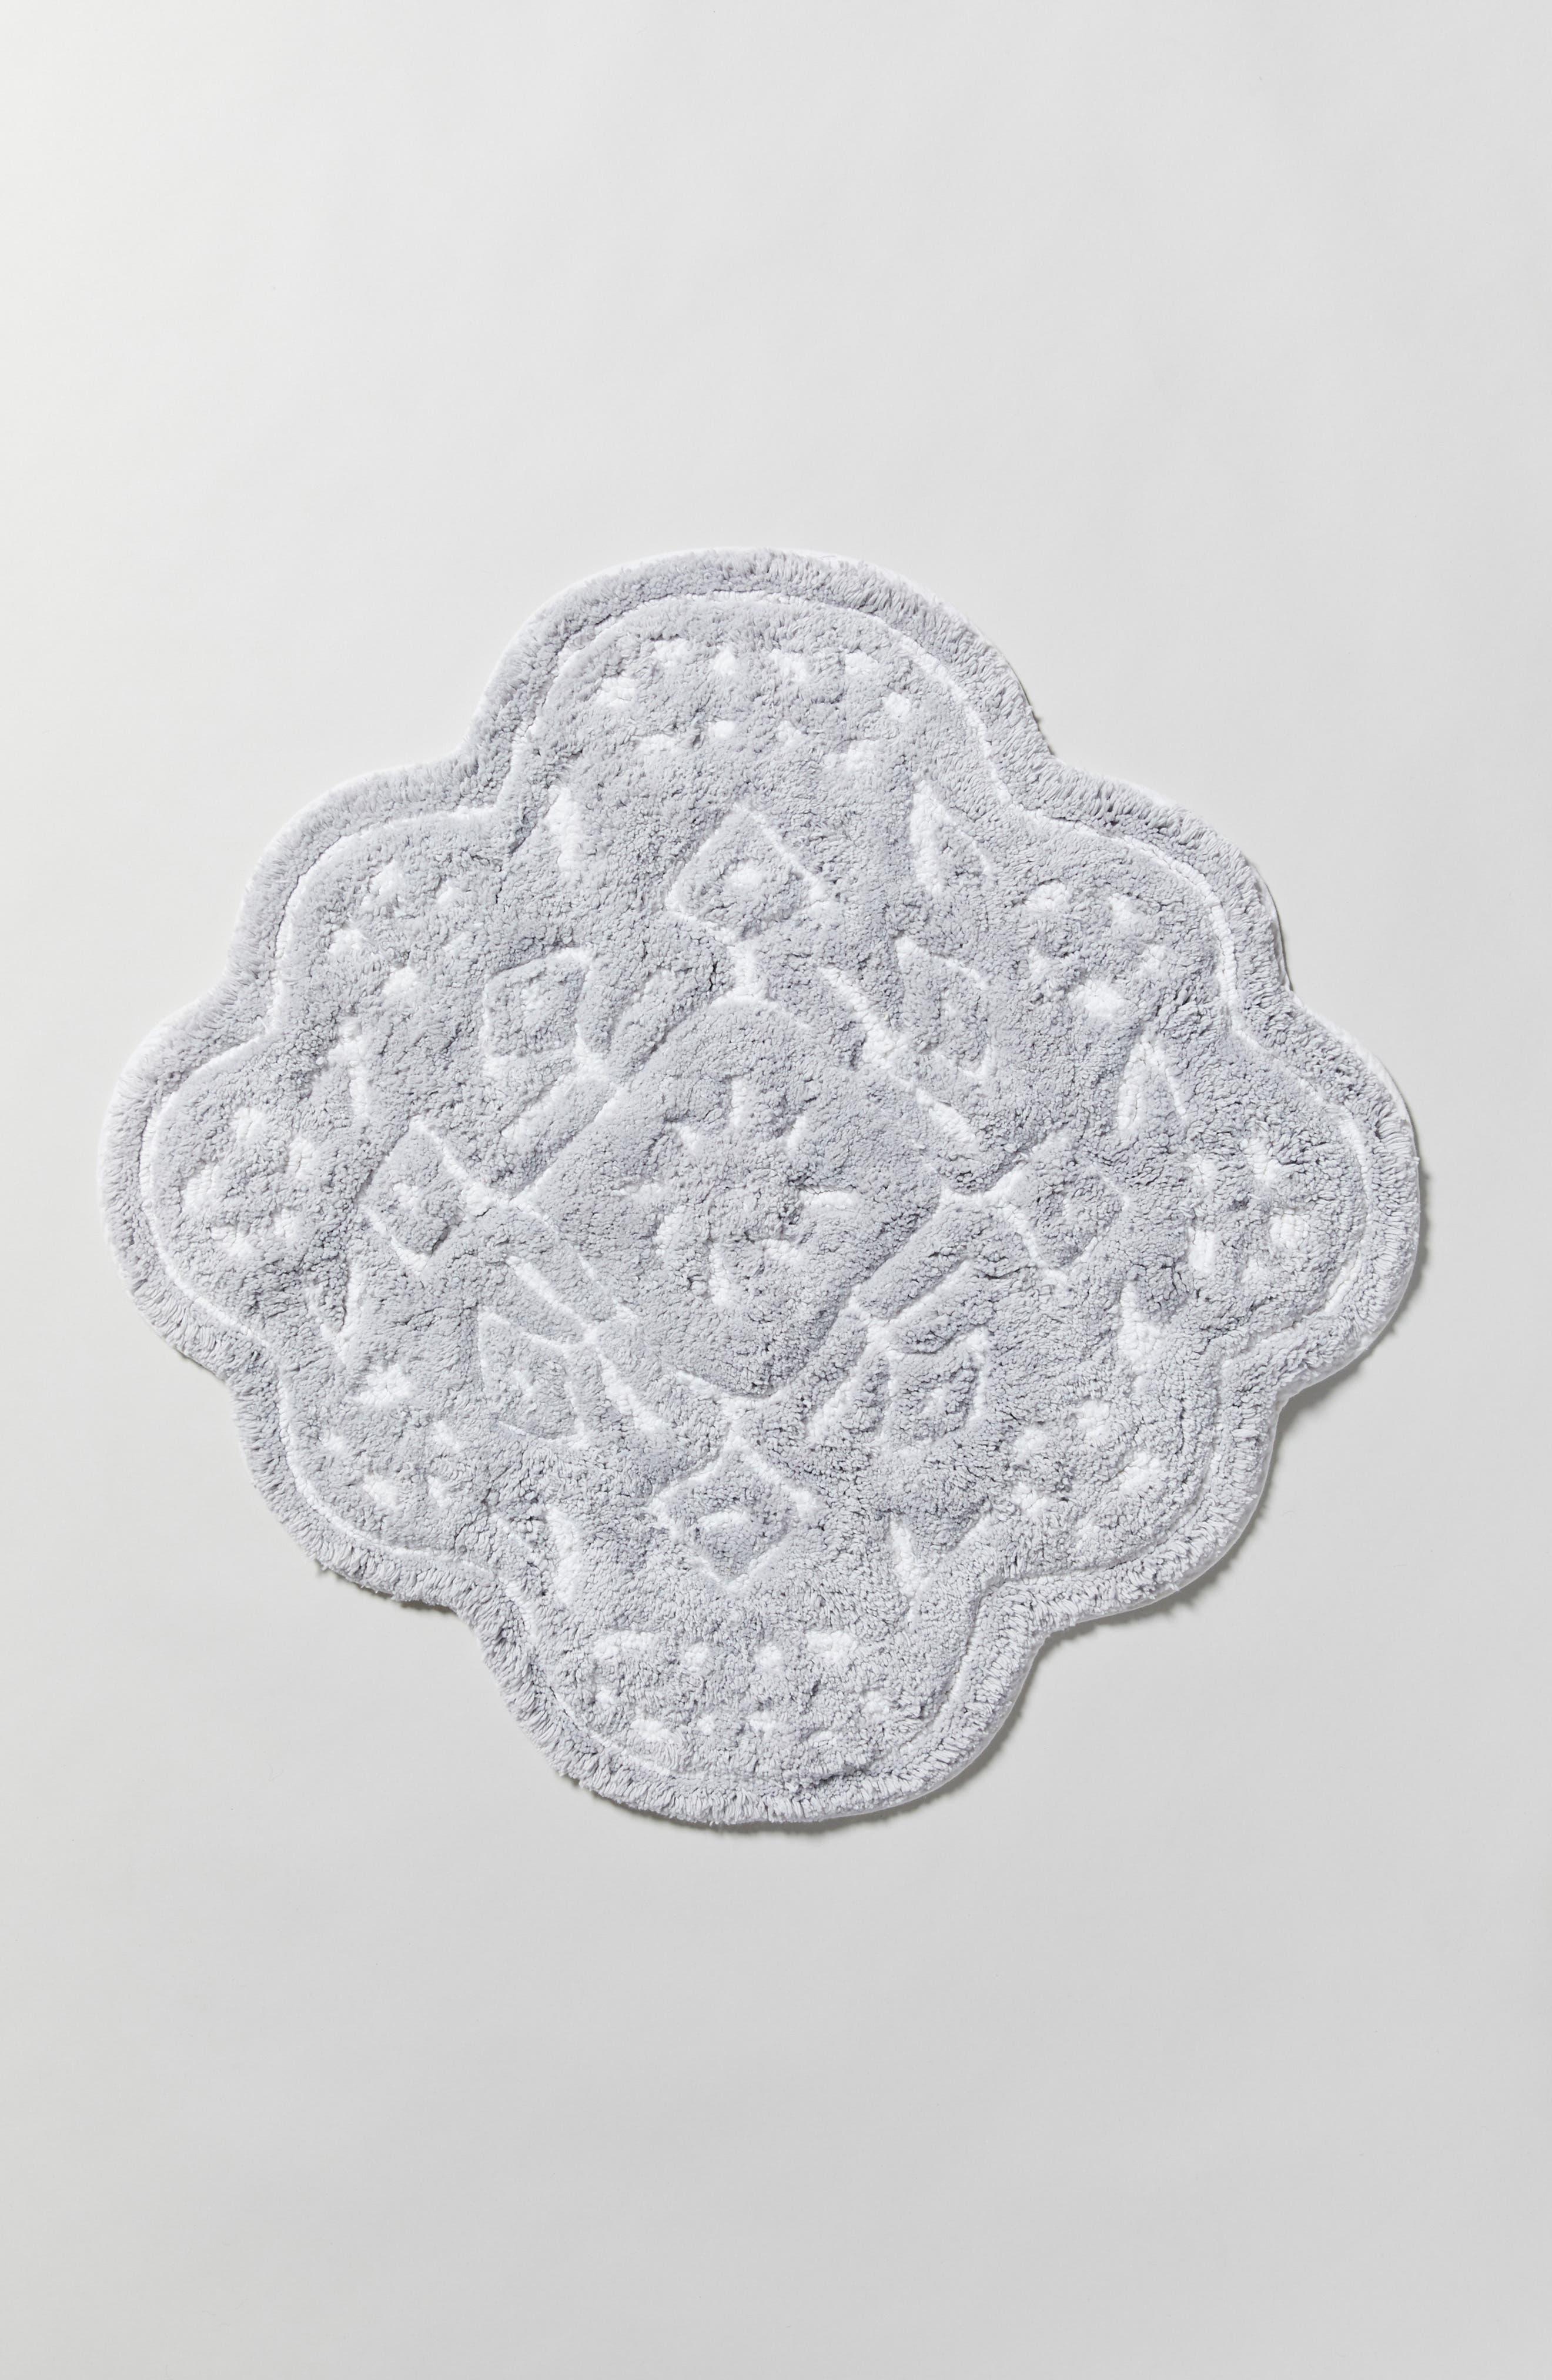 Mosaic Tile Bath Mat,                             Alternate thumbnail 4, color,                             GREY